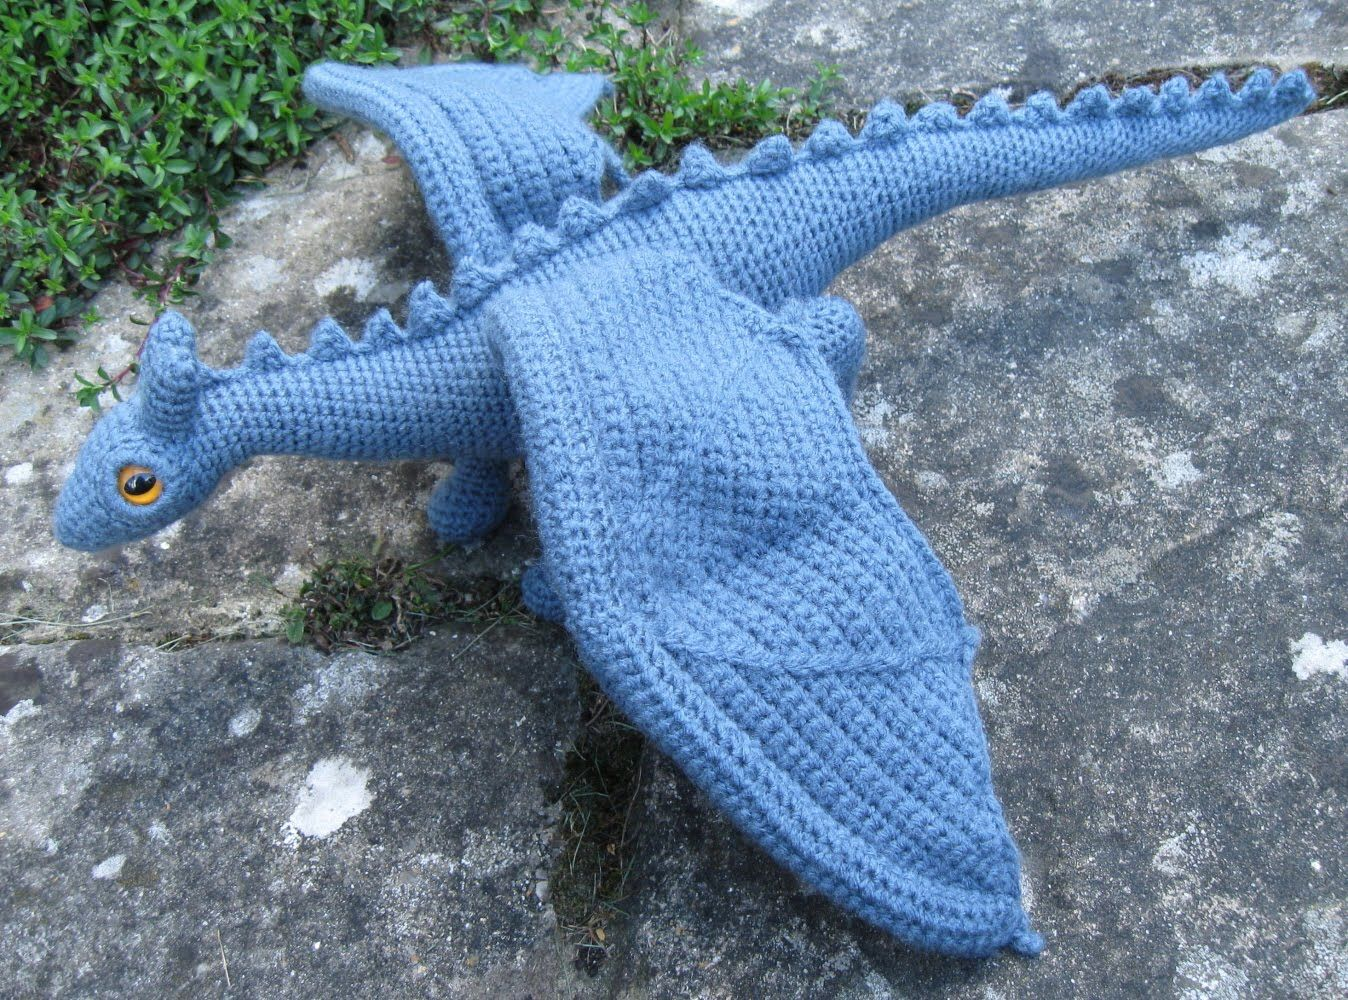 80 best crochet dragons lizards images on pinterest crochet lucyravenscar crochet creatures dragonet pattern bankloansurffo Images